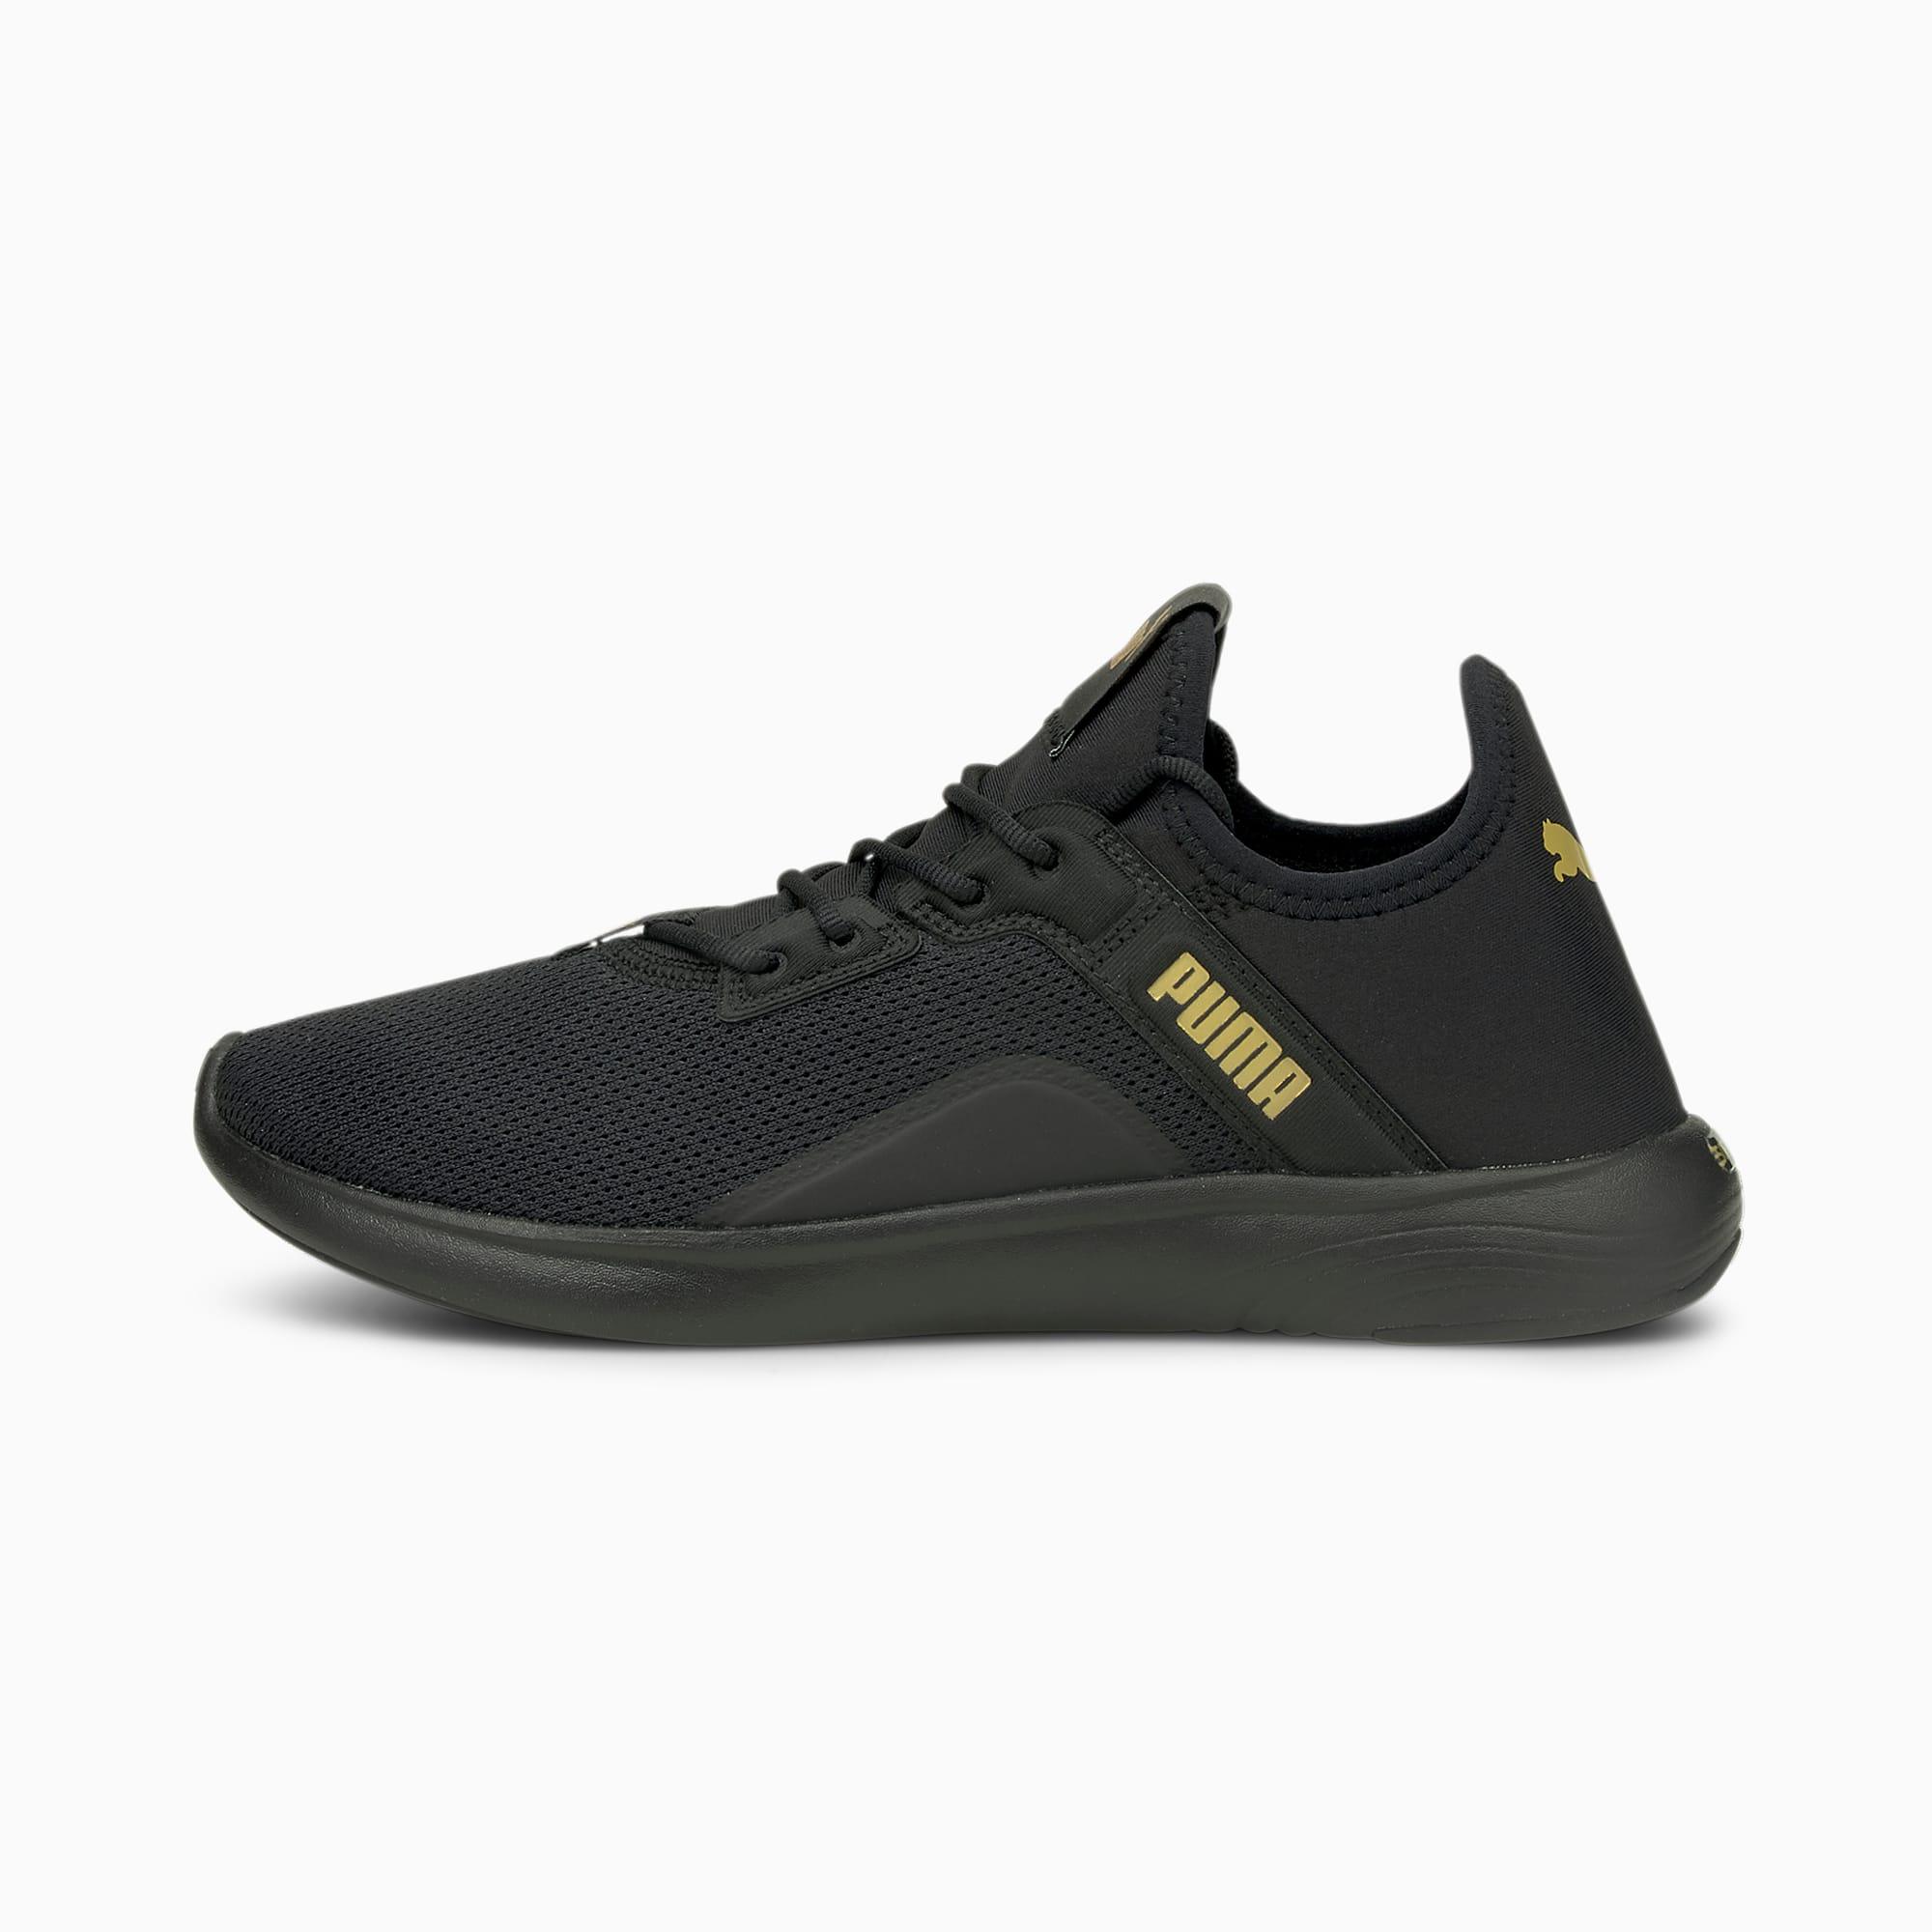 SOFTRIDE Vital Femme Women's Running Sneakers